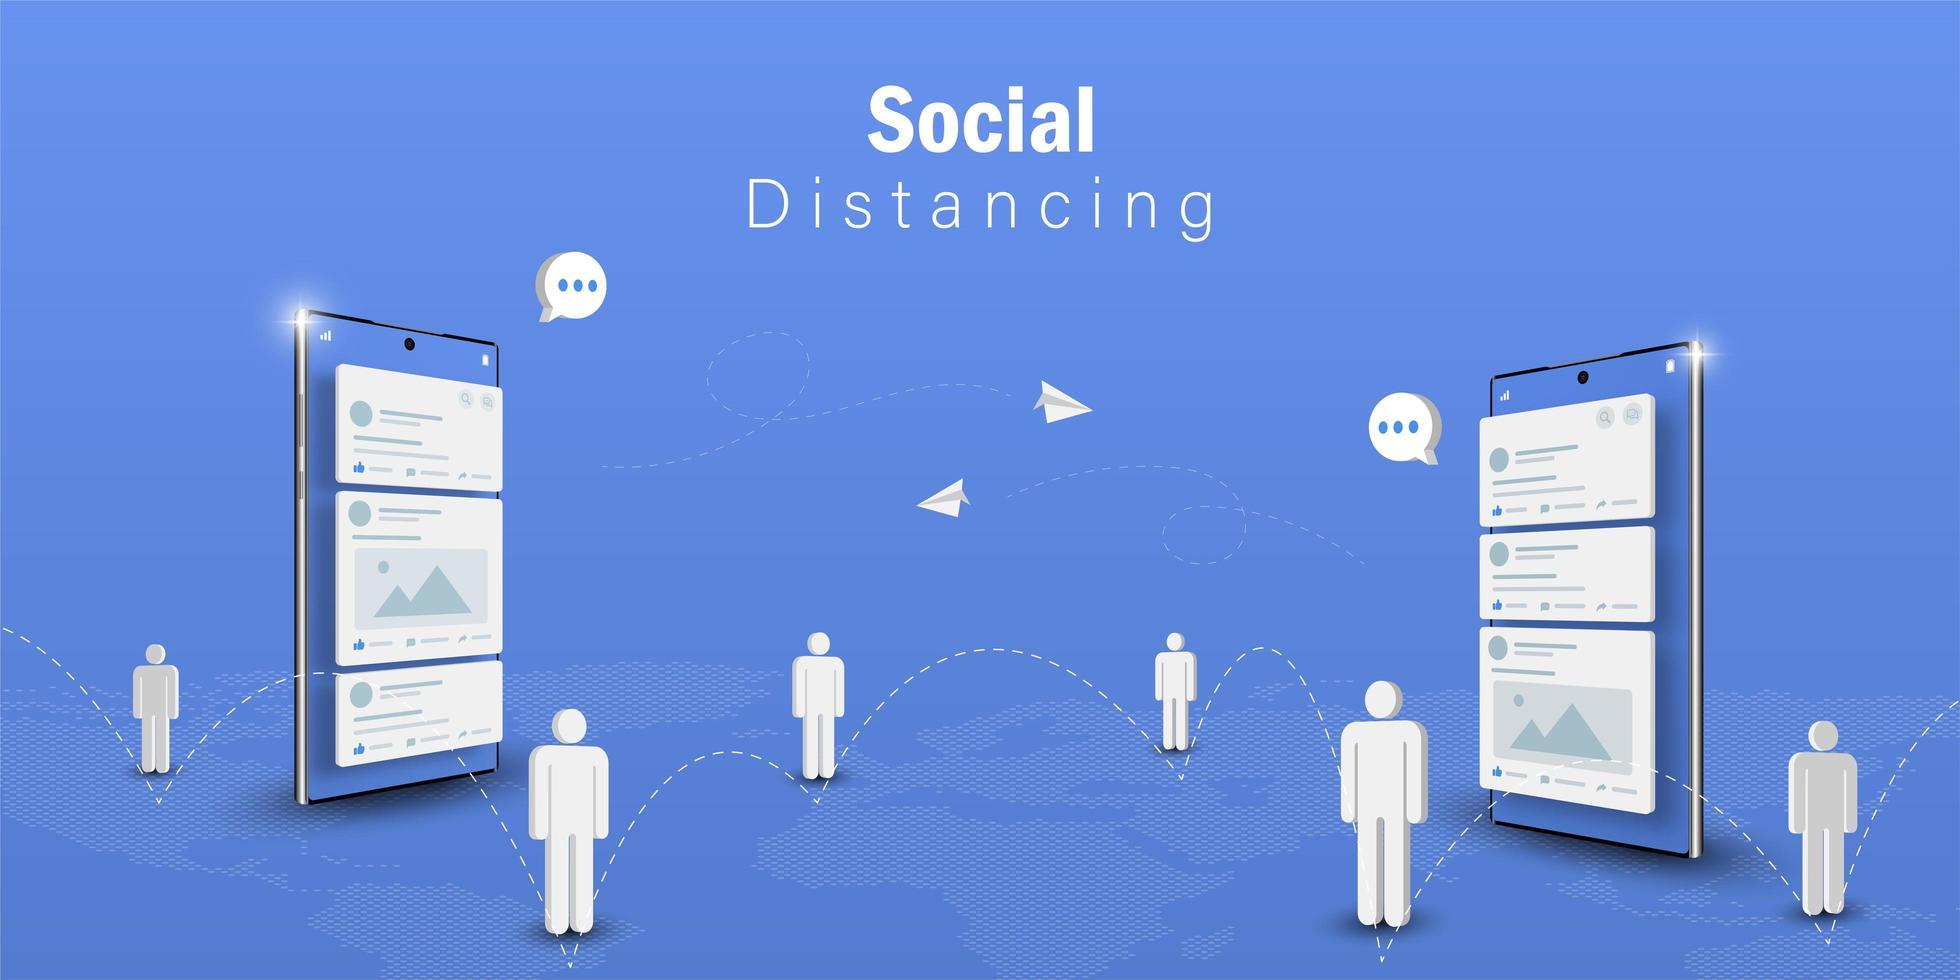 social distancing kommunikation koncept vektor